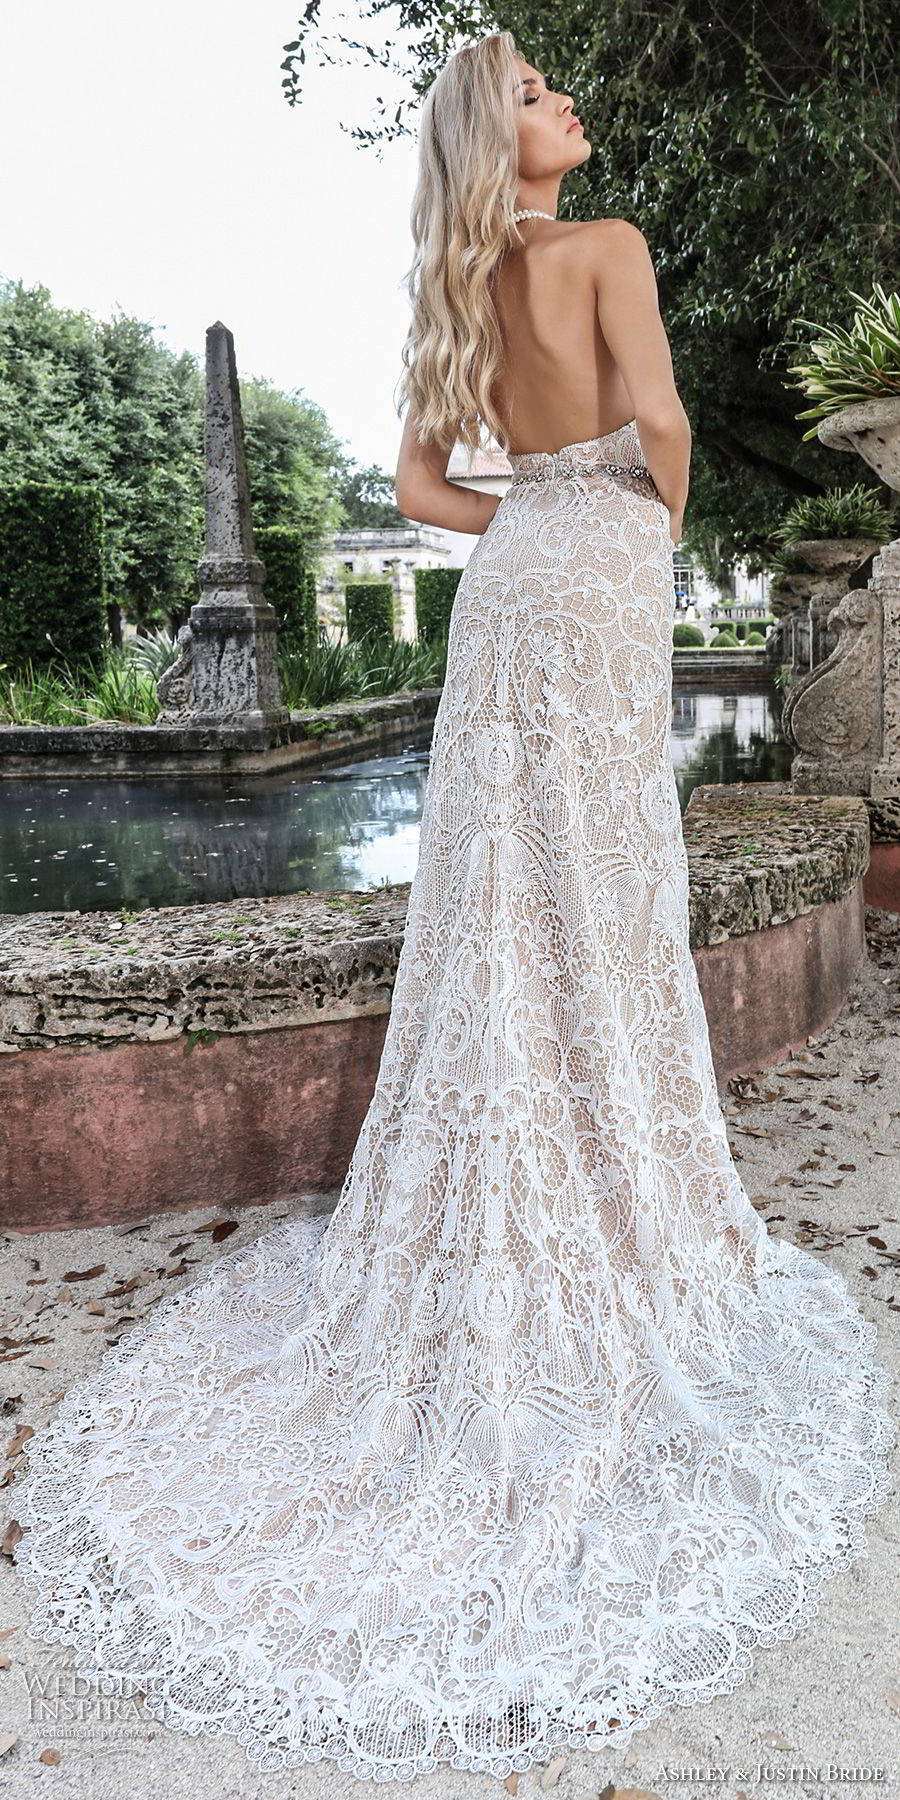 ashley justin spring 2018 bridal strapless sweetheart neckline full embellishment elegant sheath wedding dress open back medium train (15) bv